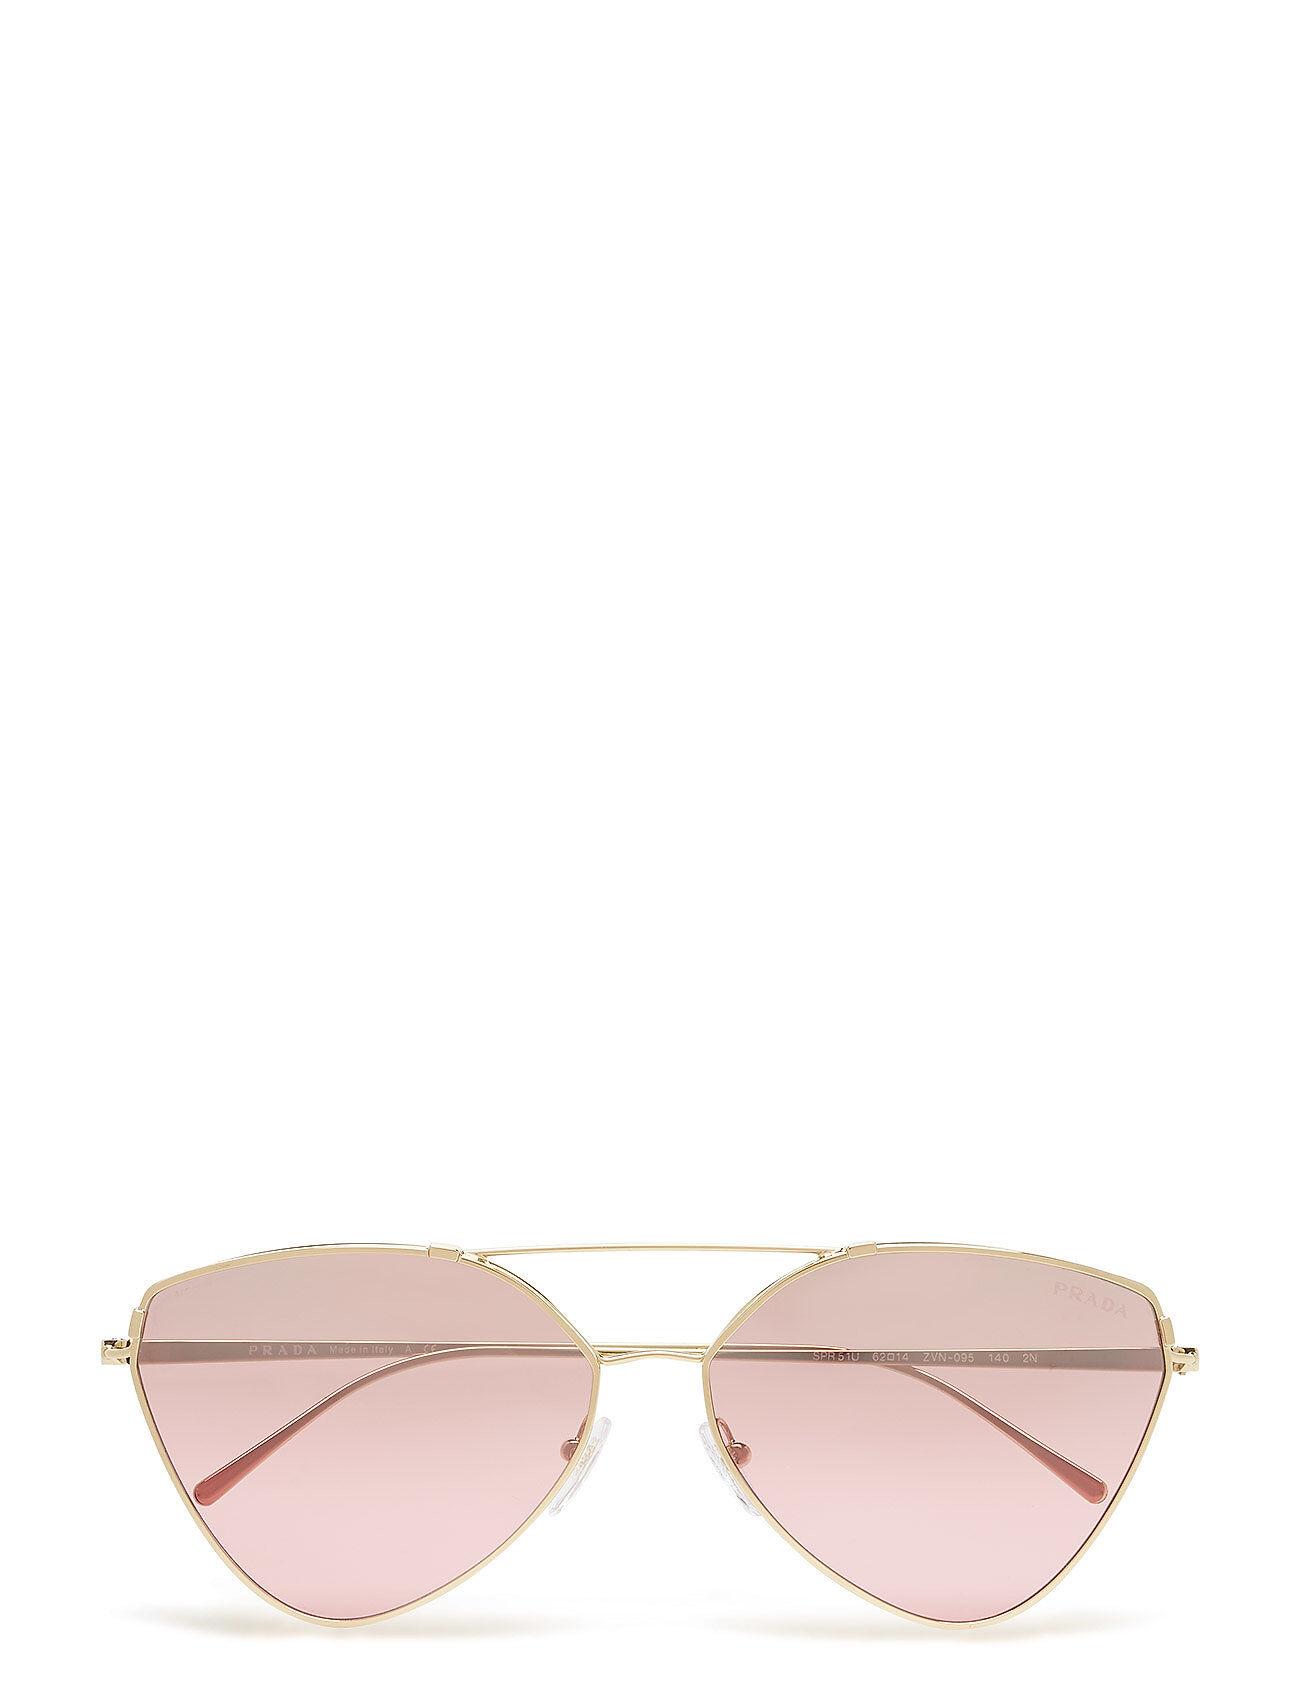 Image of Prada Sunglasses Women'S Sunglasses Neliönmuotoiset Aurinkolasit Vaaleanpunainen Prada Sunglasses